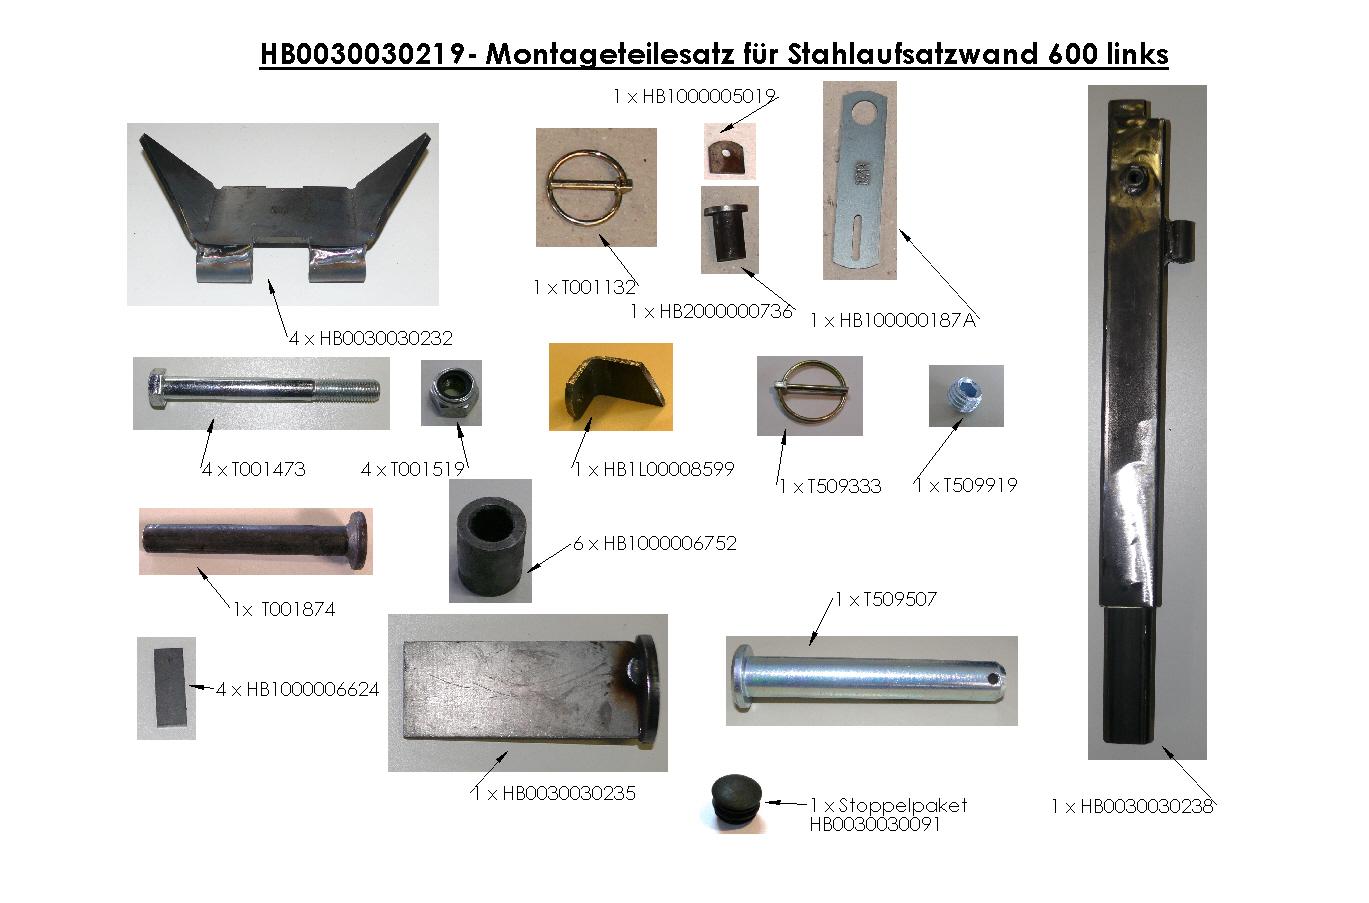 Brantner Kipper und Anhänger - assembly kit for steel attachment wall 600 left